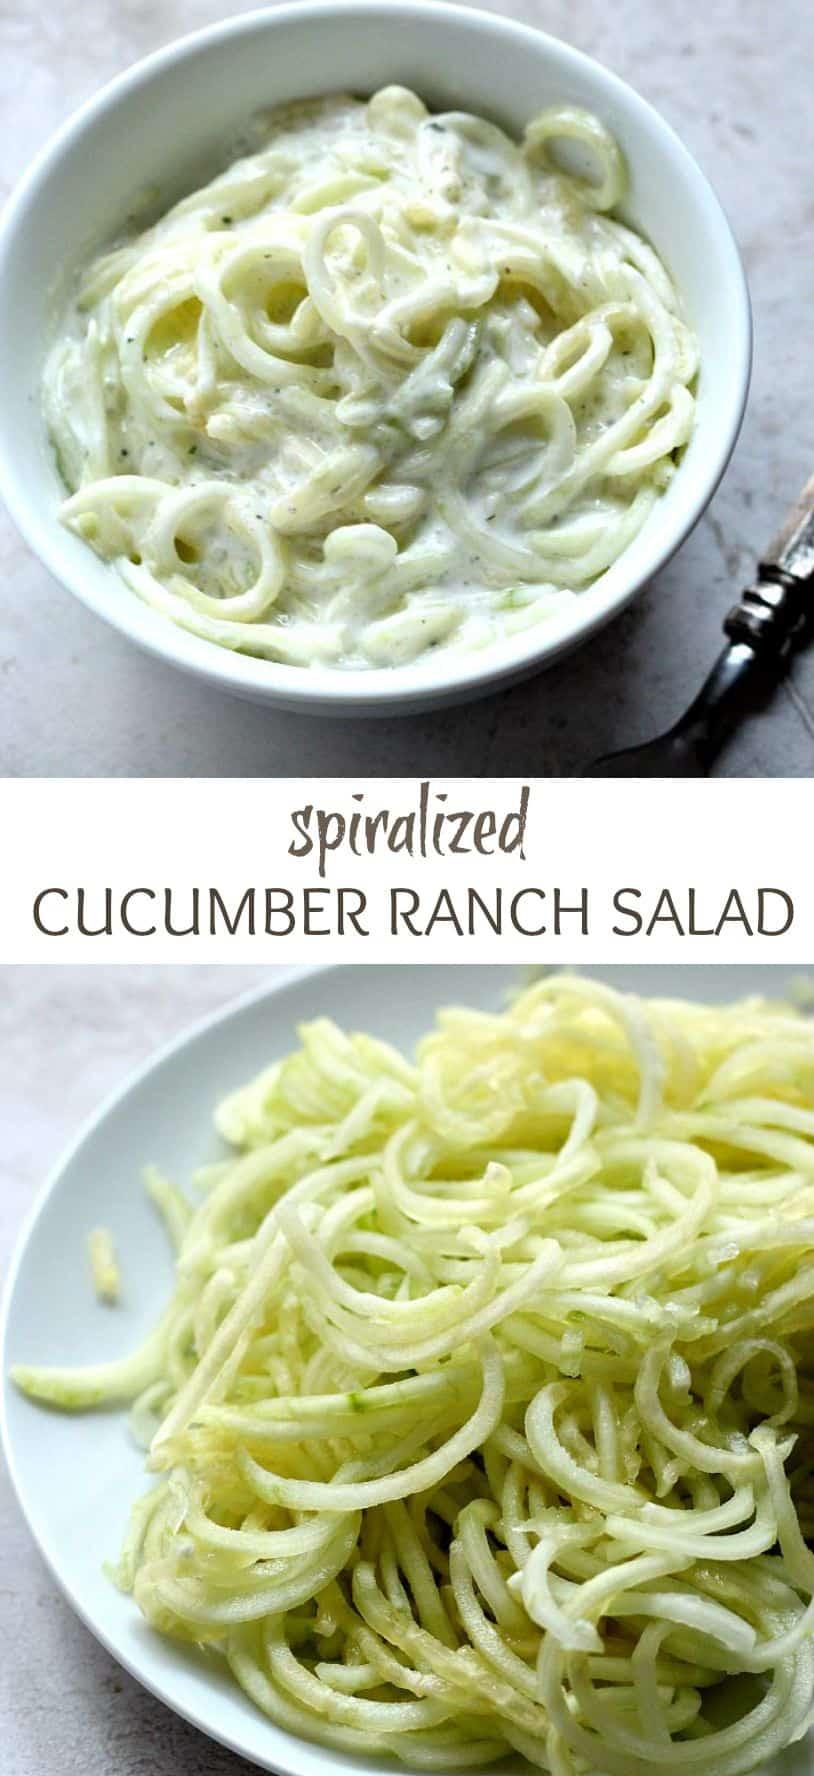 spiralized cucumber ranch salad long Spiralized Cucumber Ranch Salad